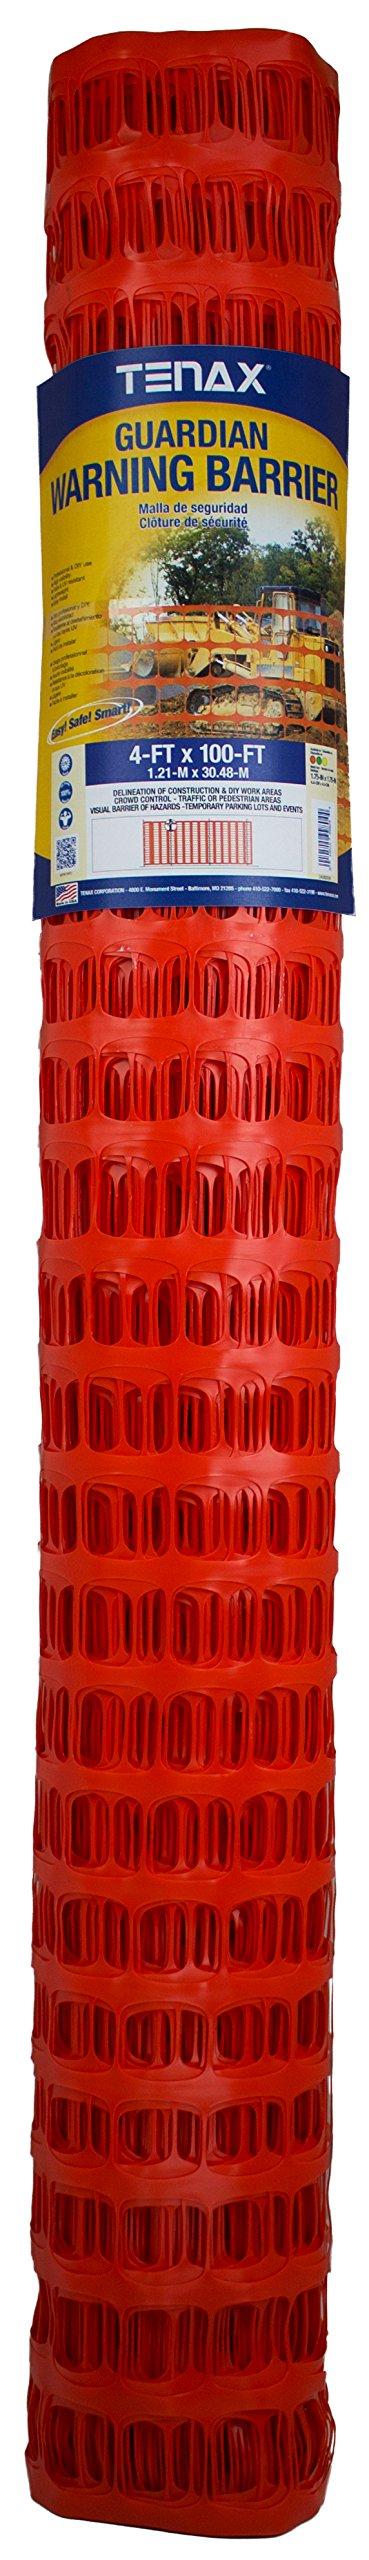 Tenax 2A060006 Guardian Economy Safety Fence, Orange, 4-Feet by 100-Feet by Tenax